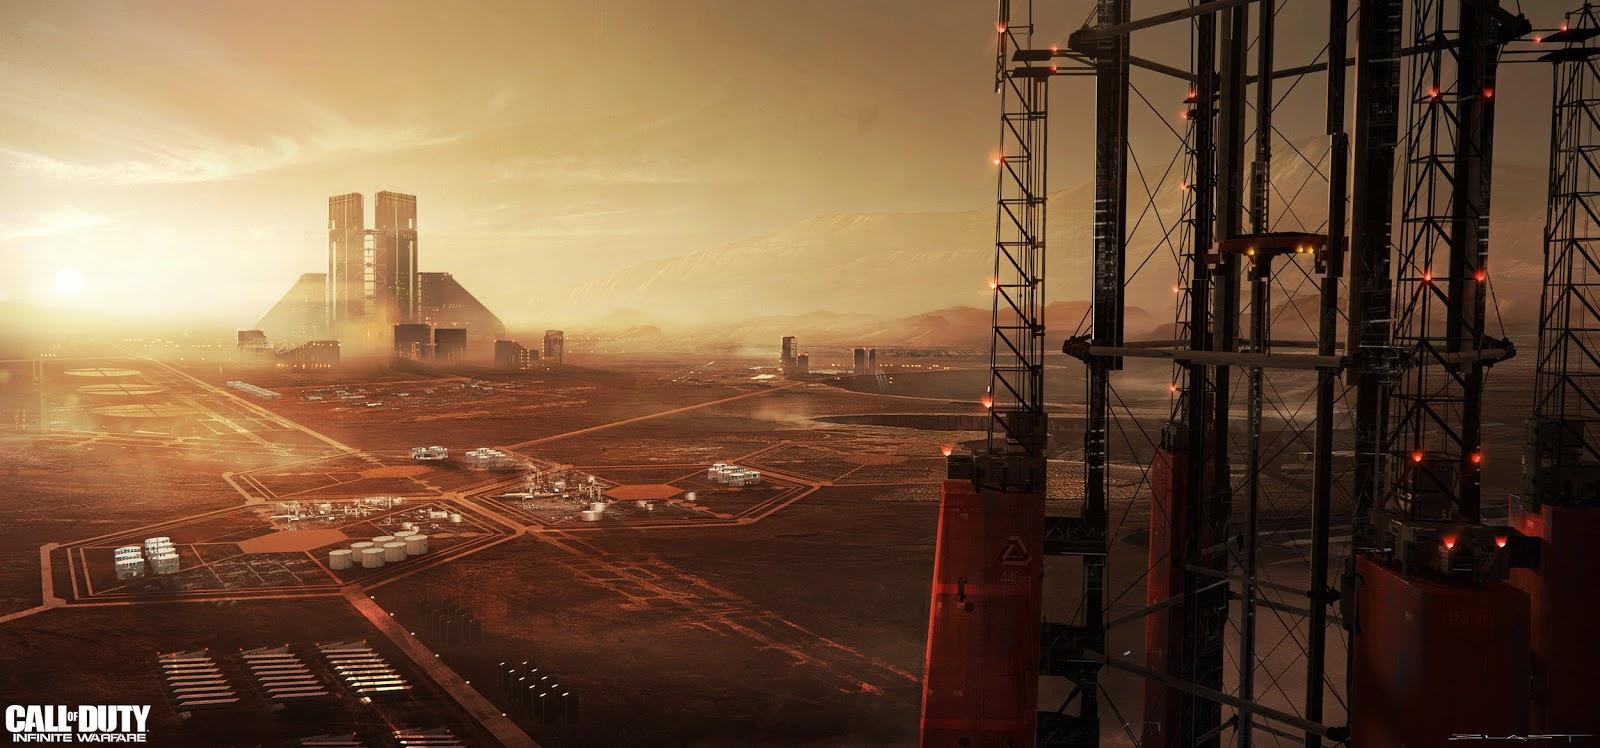 Industrial Mars by Benjamin Last - concept art for Call of Duty Infinite Warfare